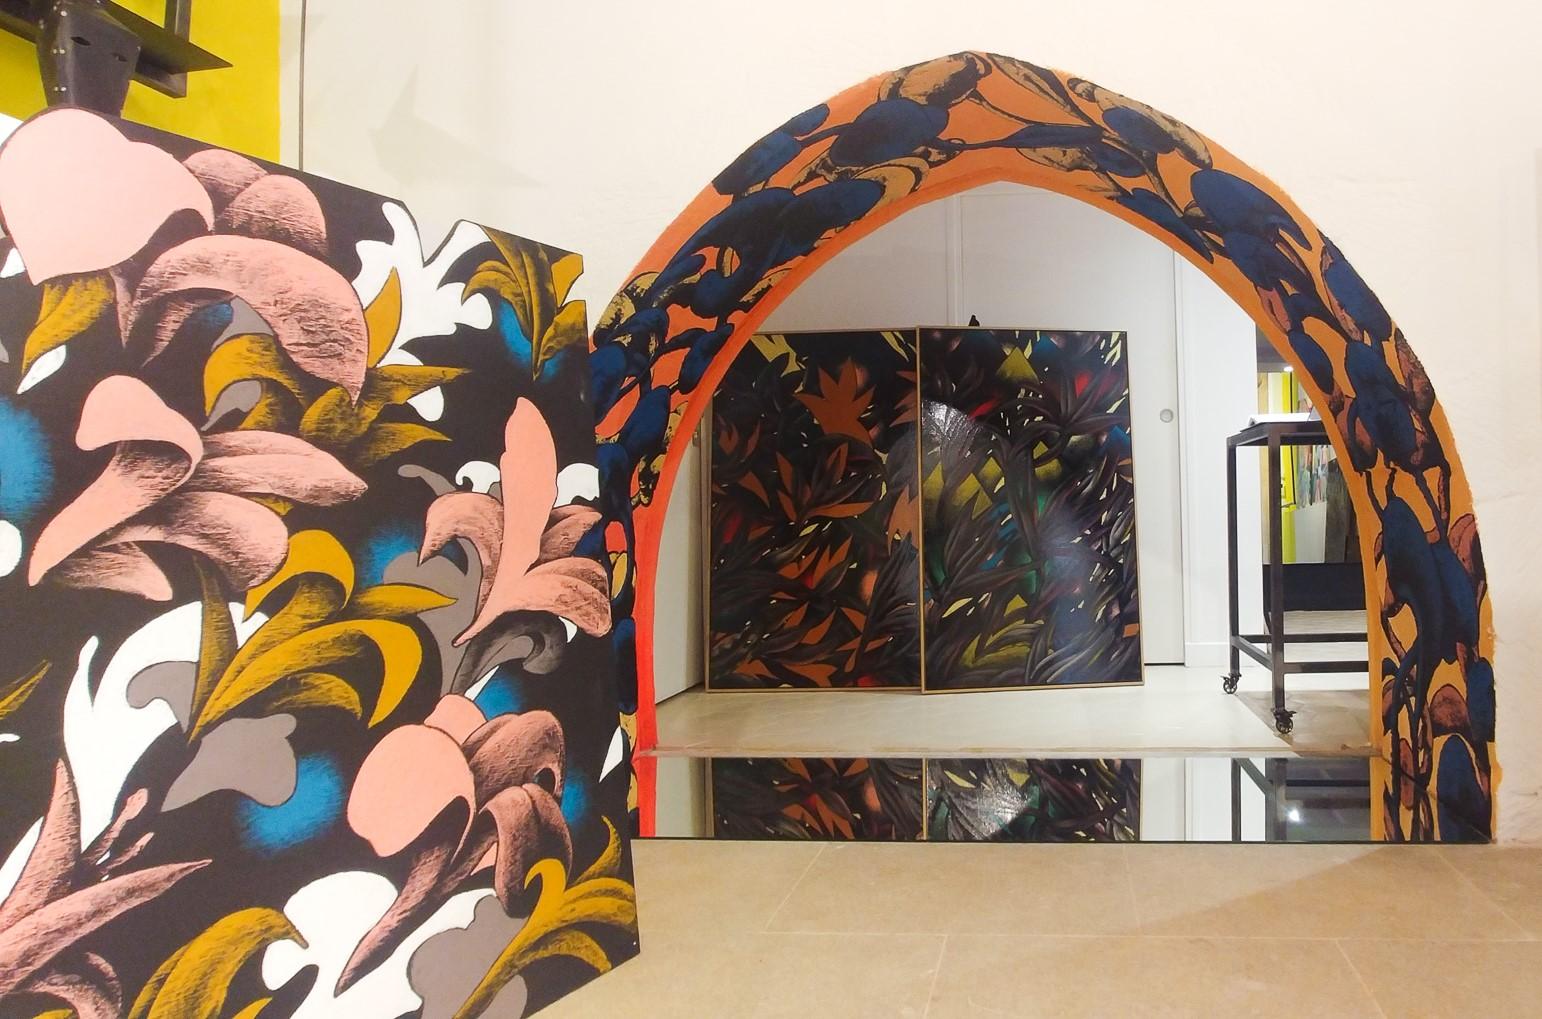 Galerie Ars Longa Julien Colombier